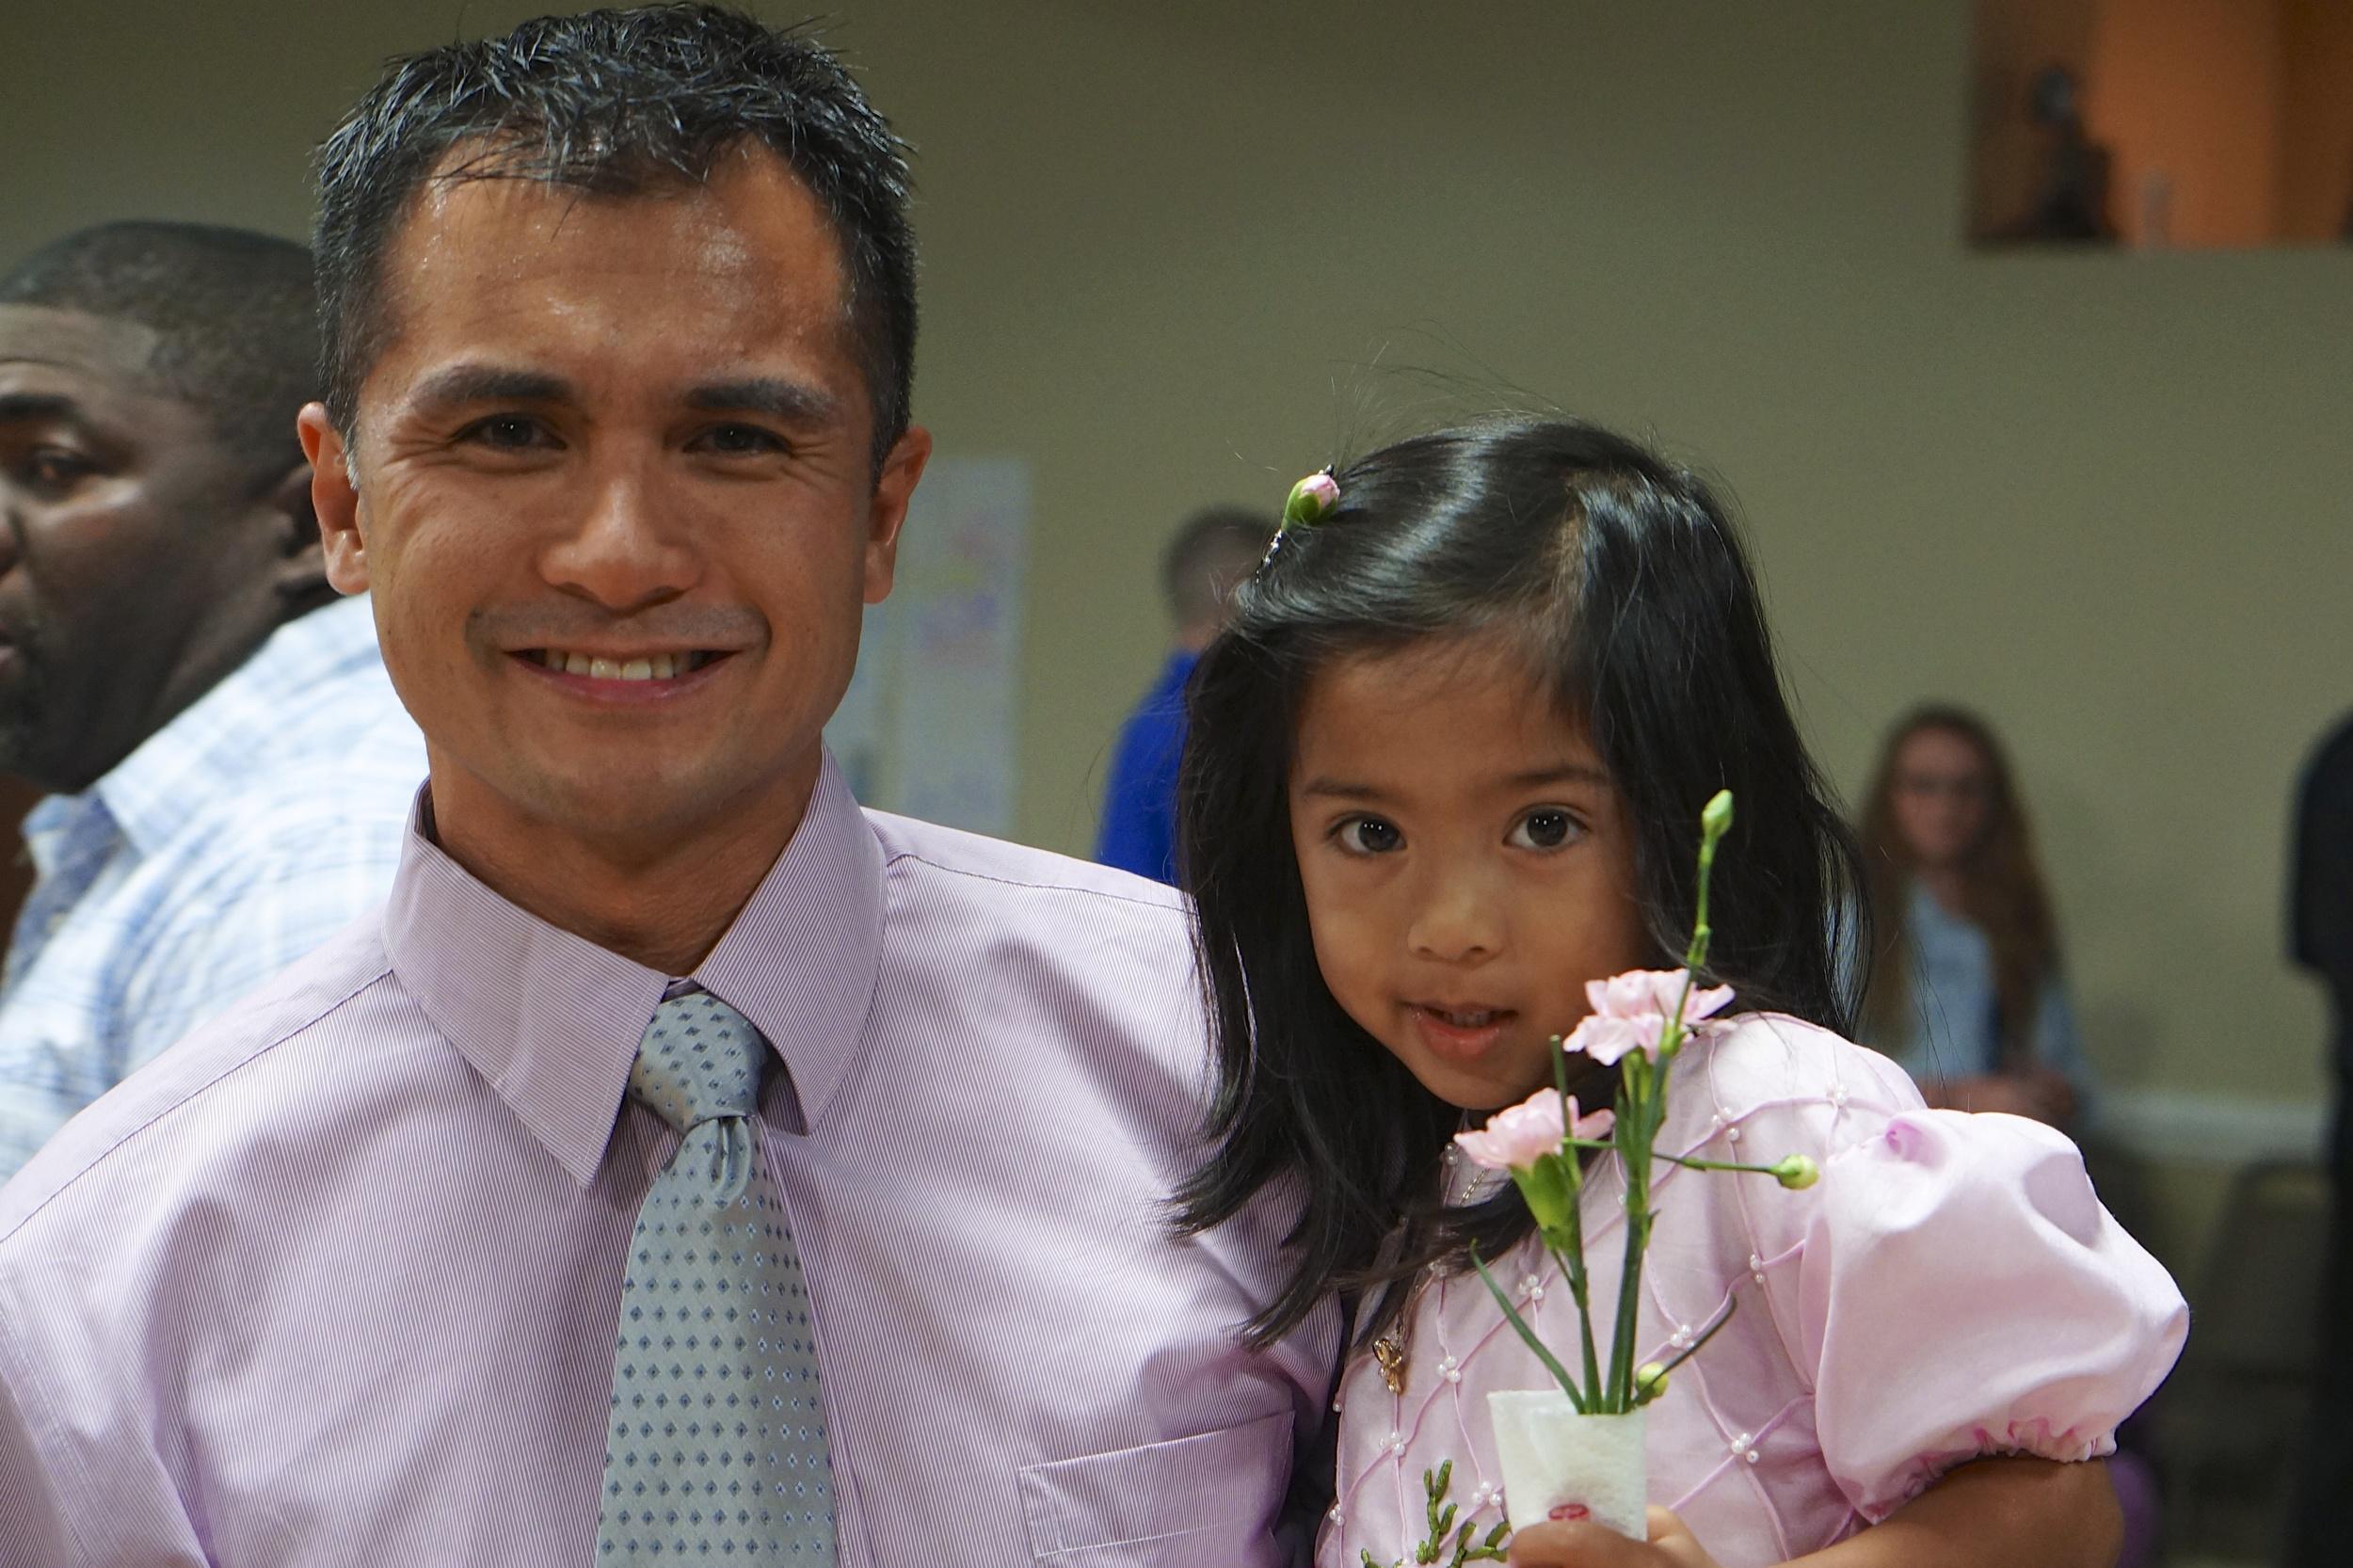 Father Daughter Dance HRC 2013 101.jpg